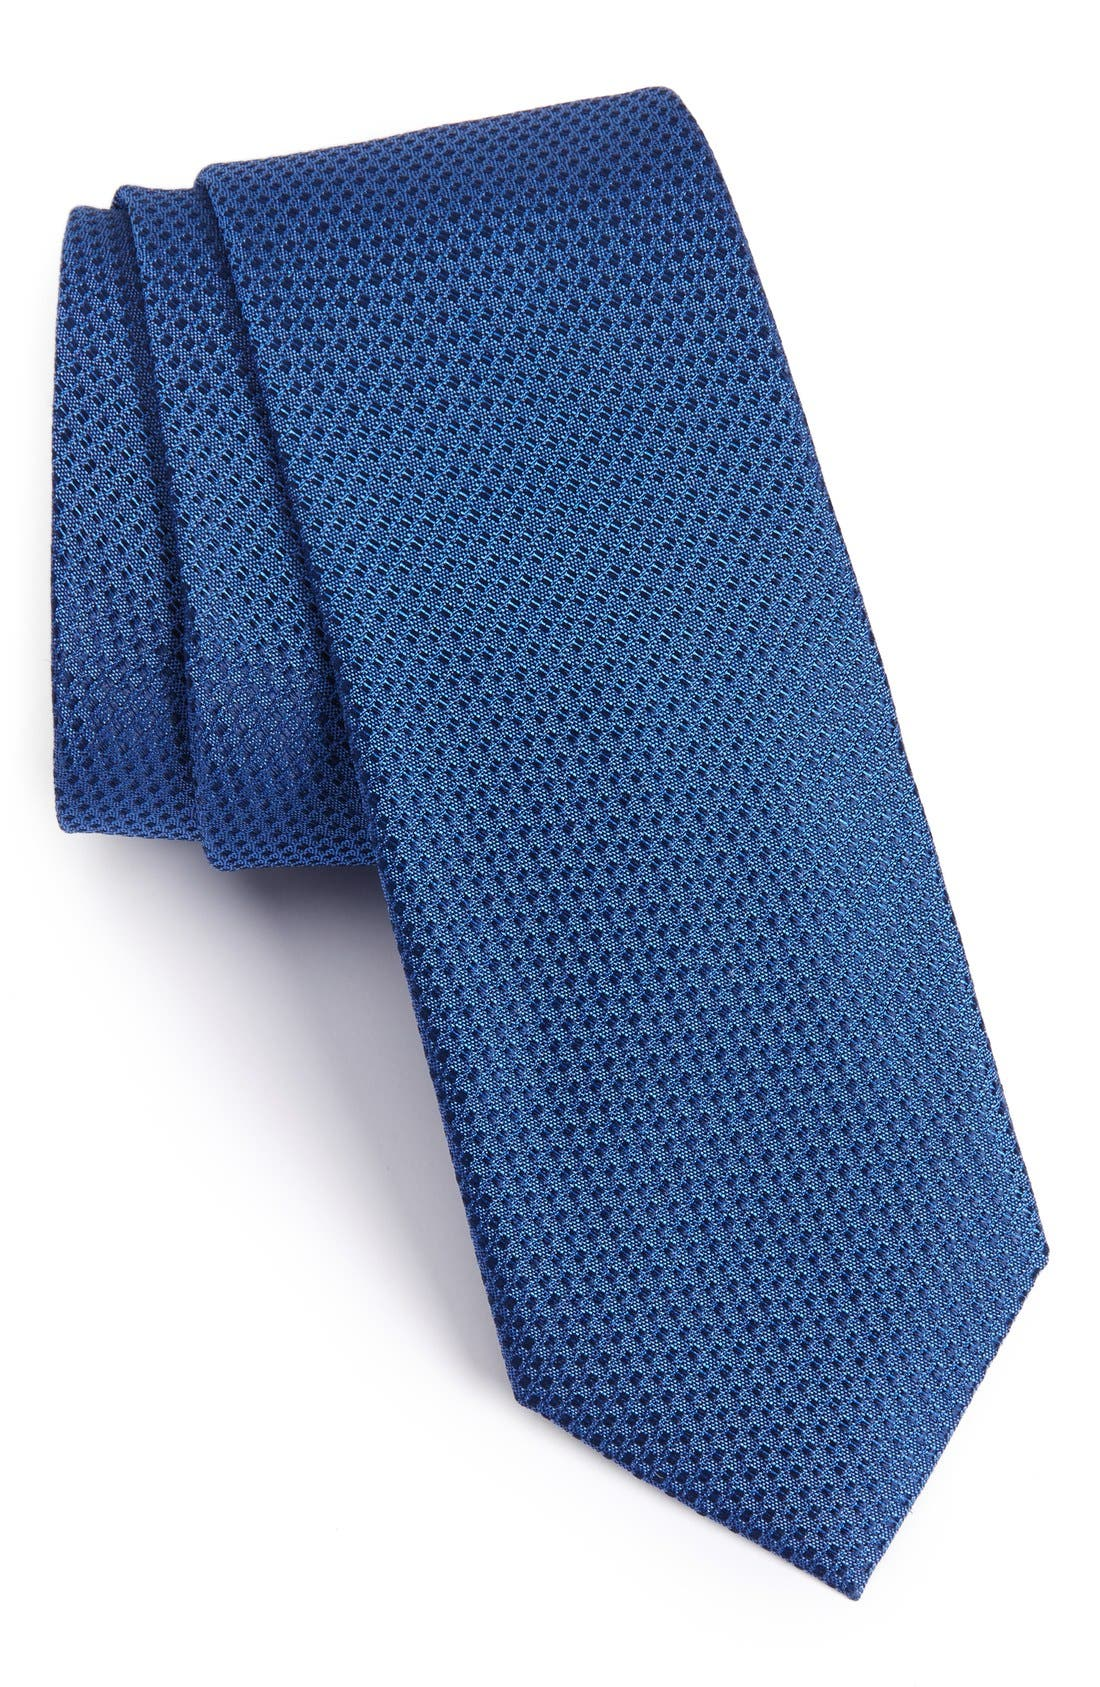 Seattle Textured Silk Tie,                             Alternate thumbnail 98, color,